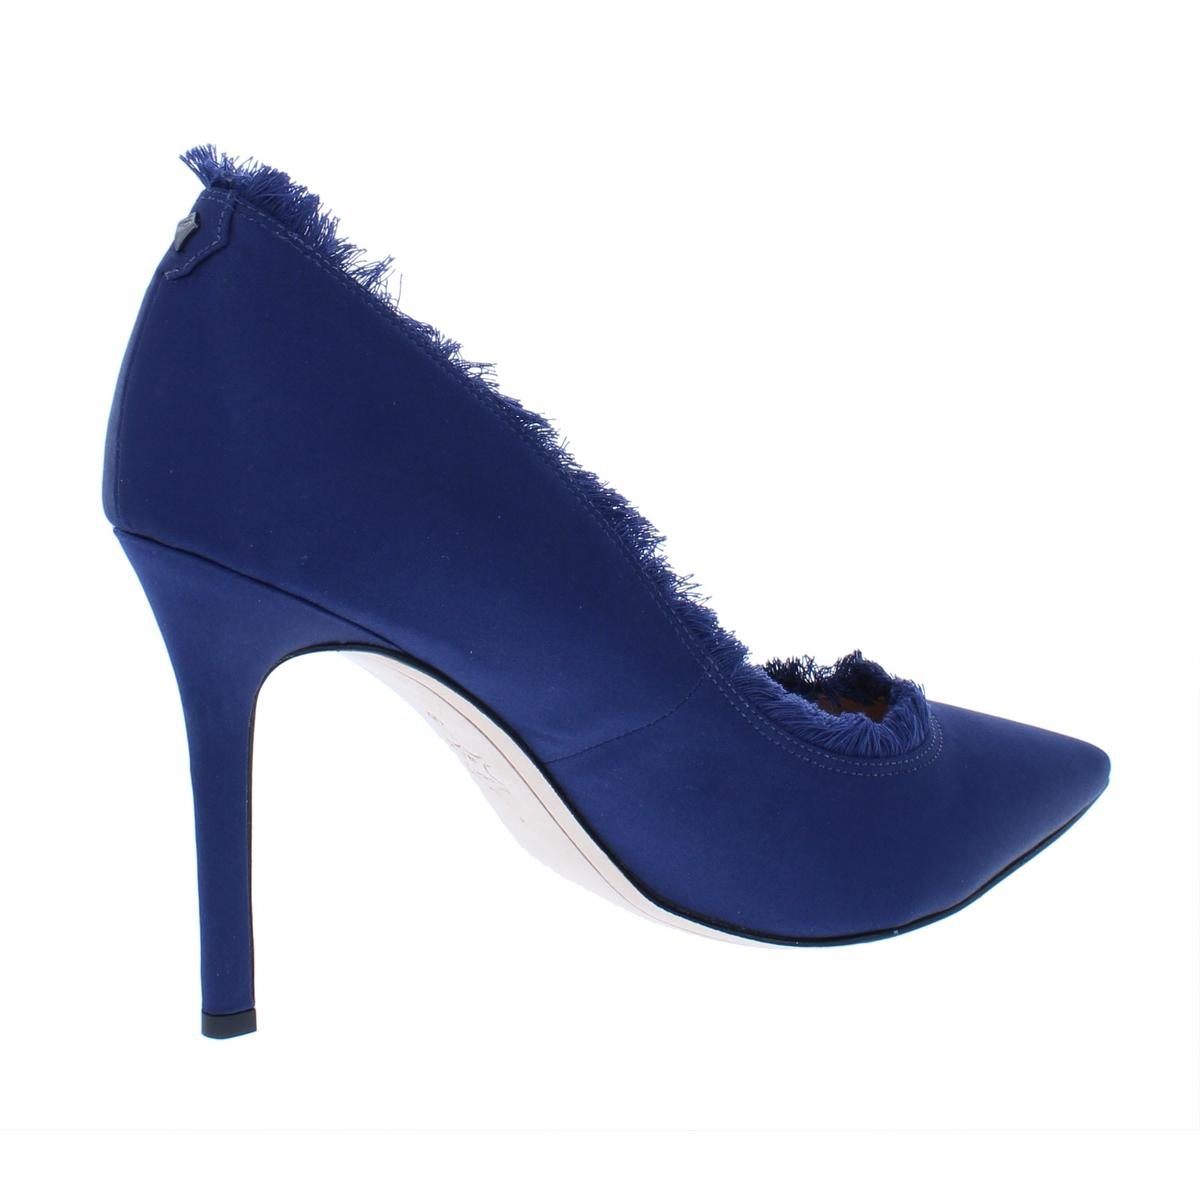 b0b610642 Sam Edelman Womens Halan Navy Pointed Toe Heels Shoes 8.5 Medium (B ...